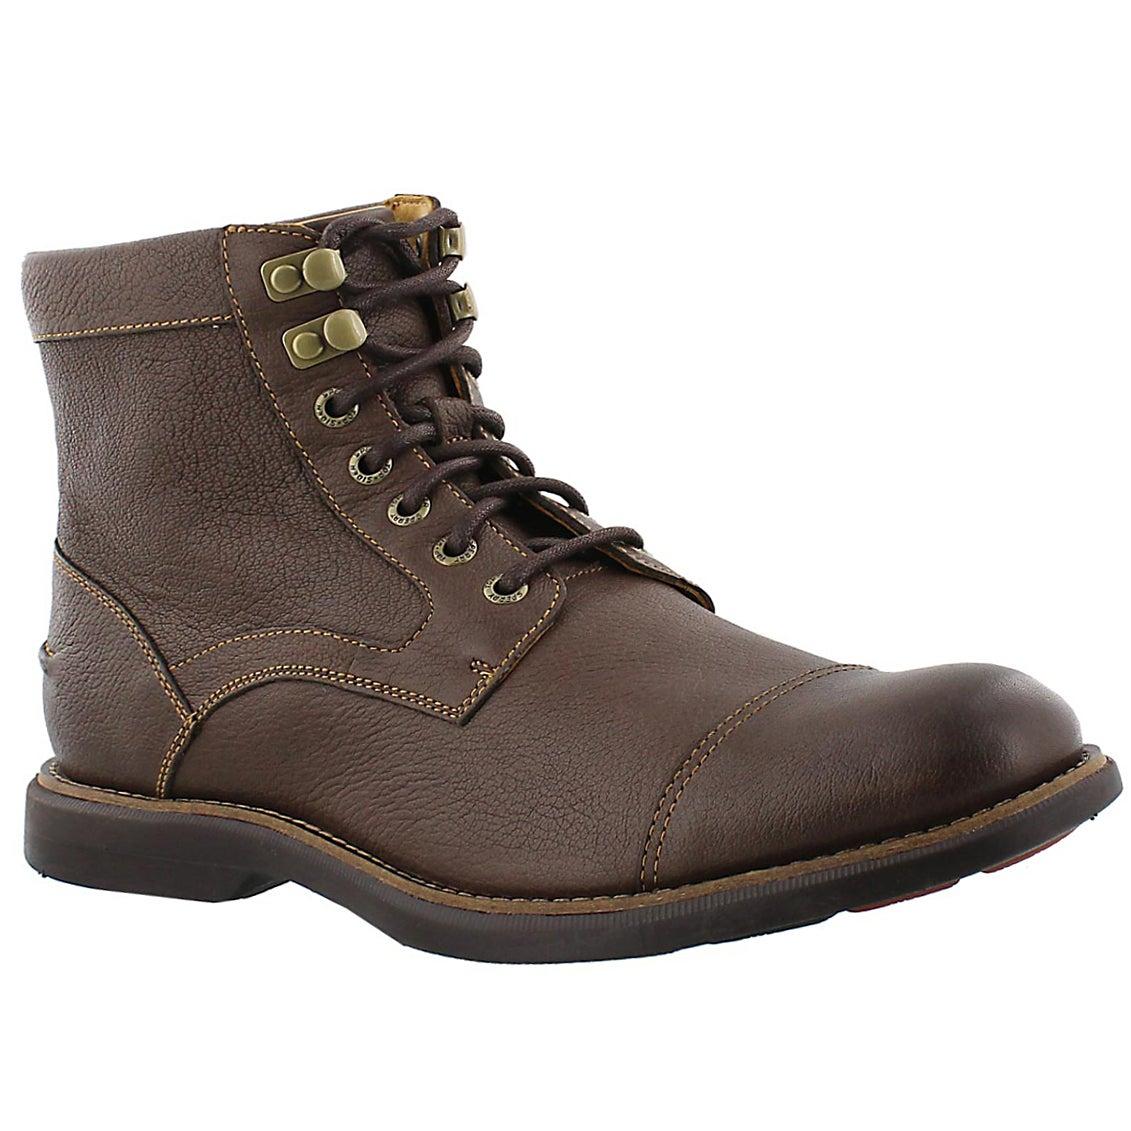 Mns Gold Bellingham brn  boot